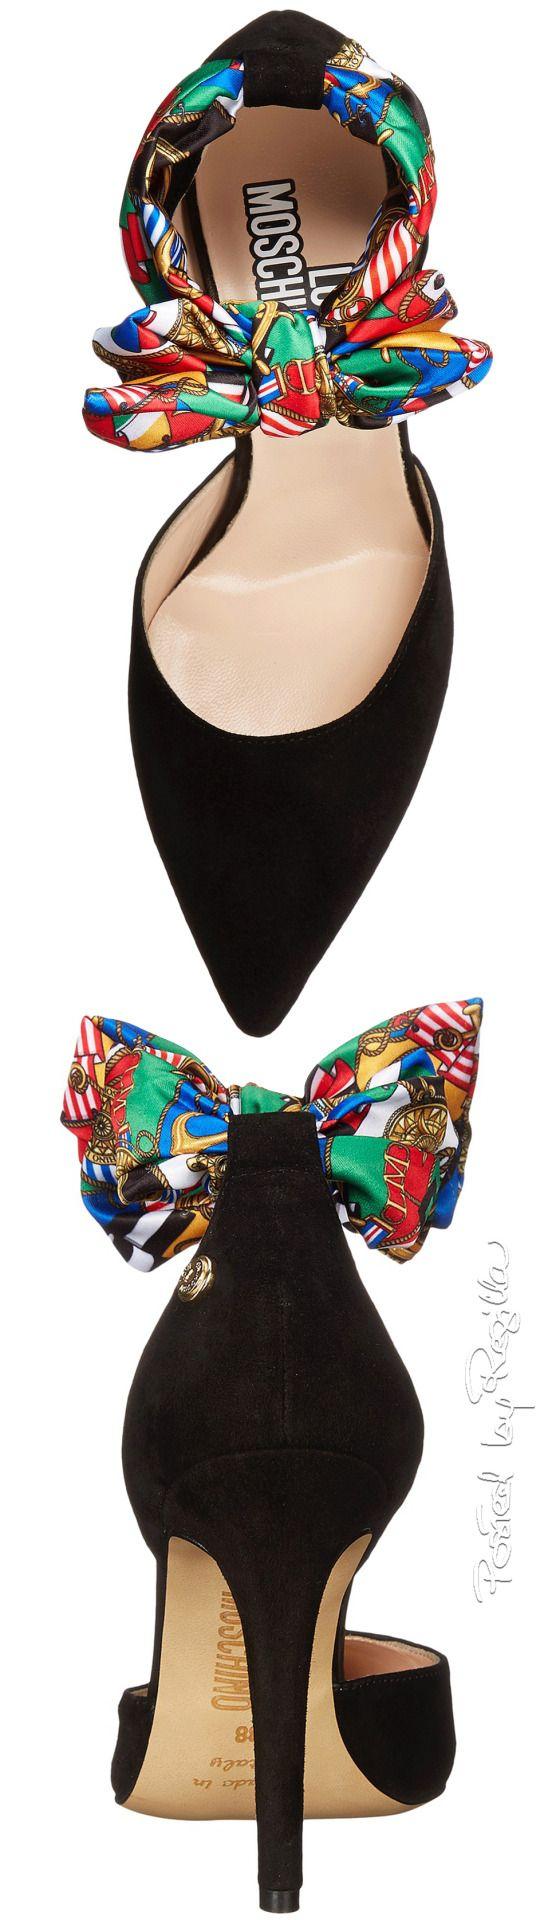 LUXURY BRANDS | Moschino black shoes with silk | www.bocadolobo.com #luxurybrands